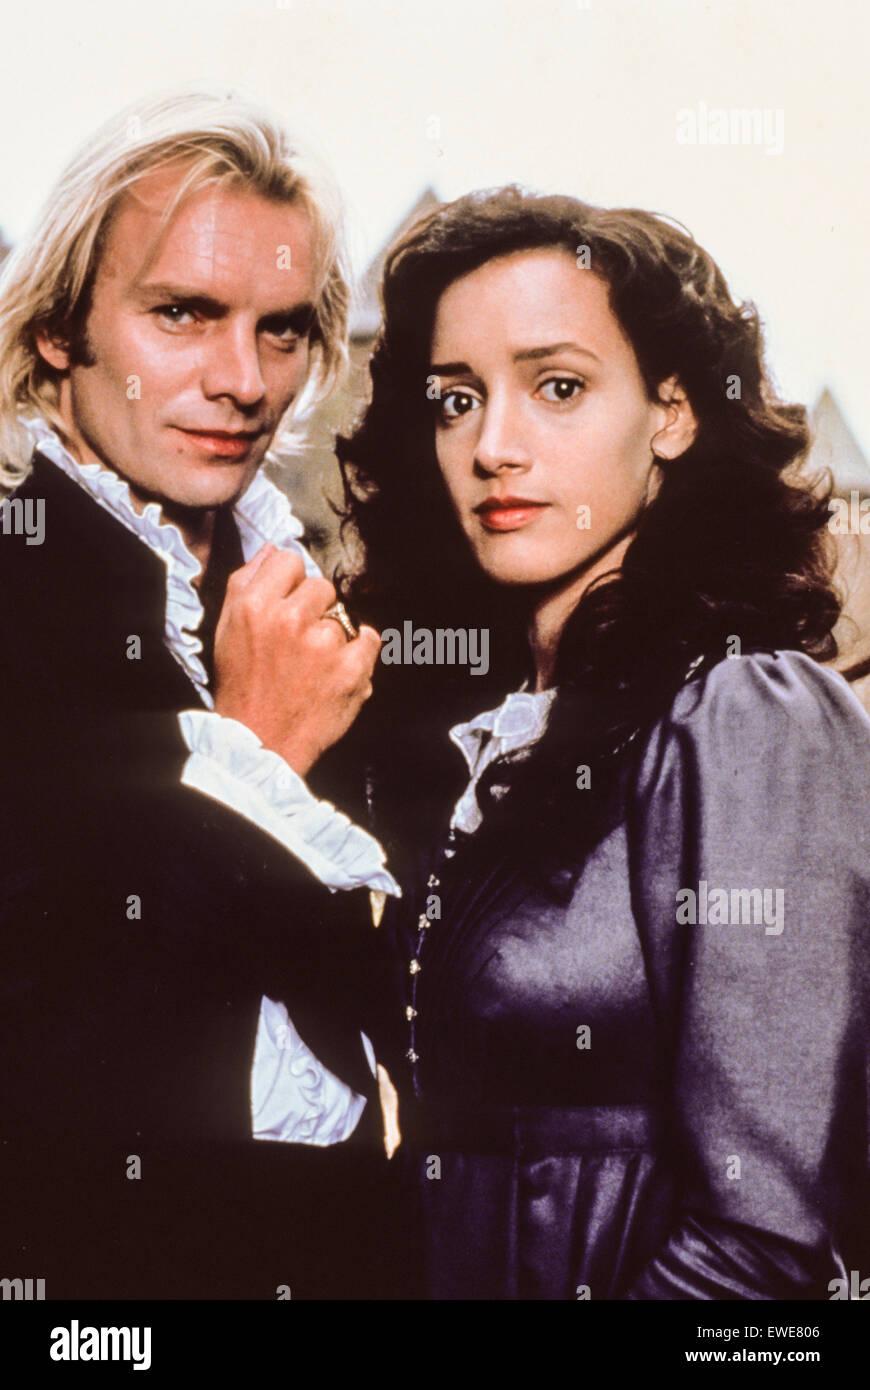 Sting, Jennifer Beals, die Braut, 1985 Stockbild